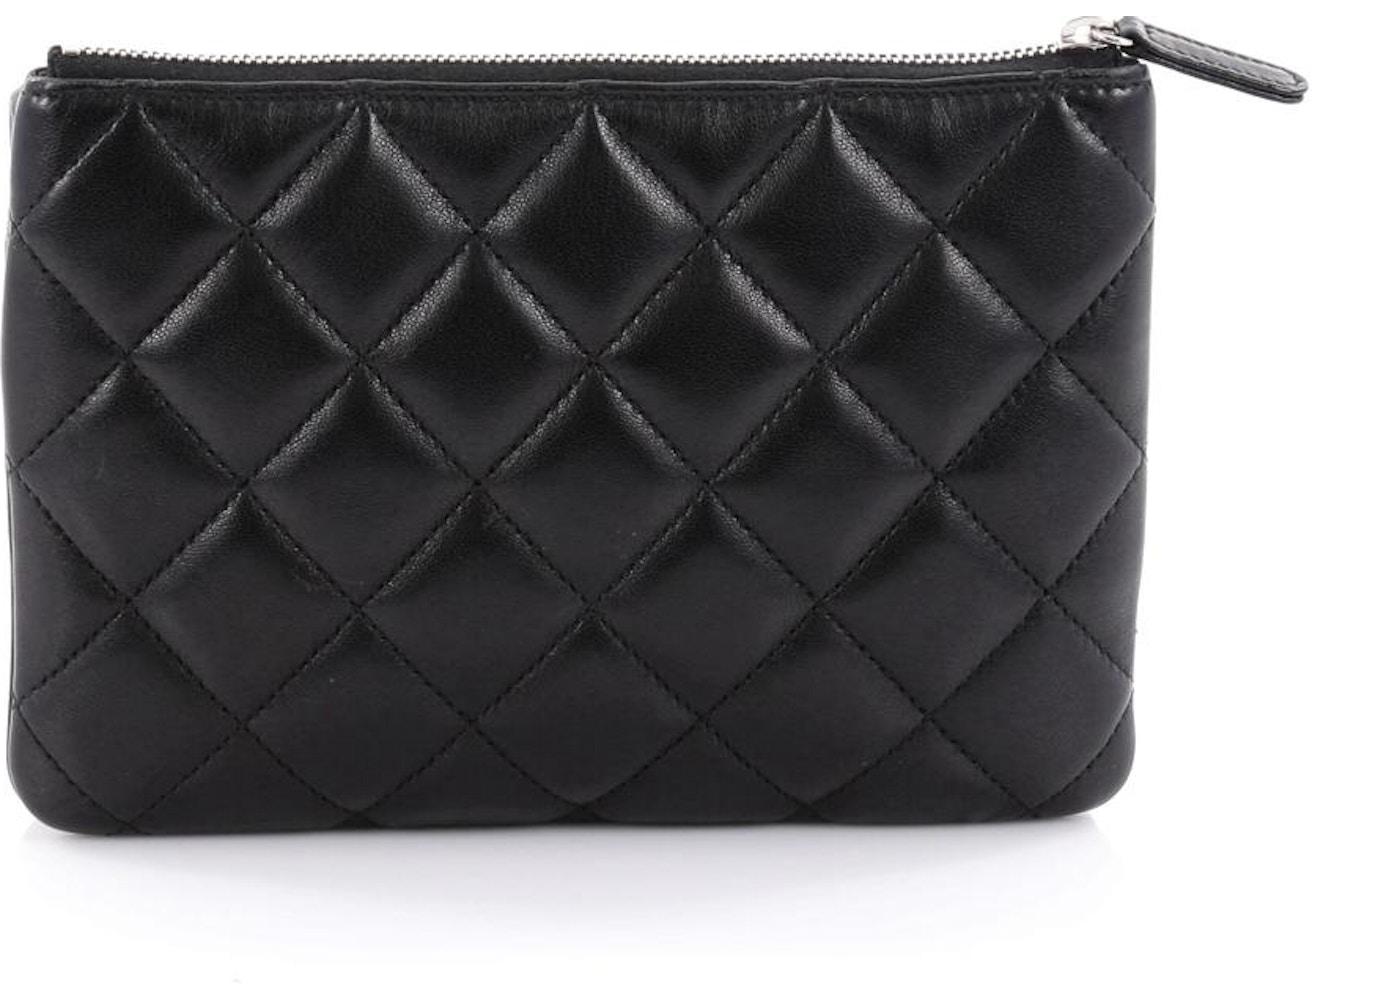 250787d1ecaa Chanel Daily Zippy Crossbody Quilted Diamond Small Black